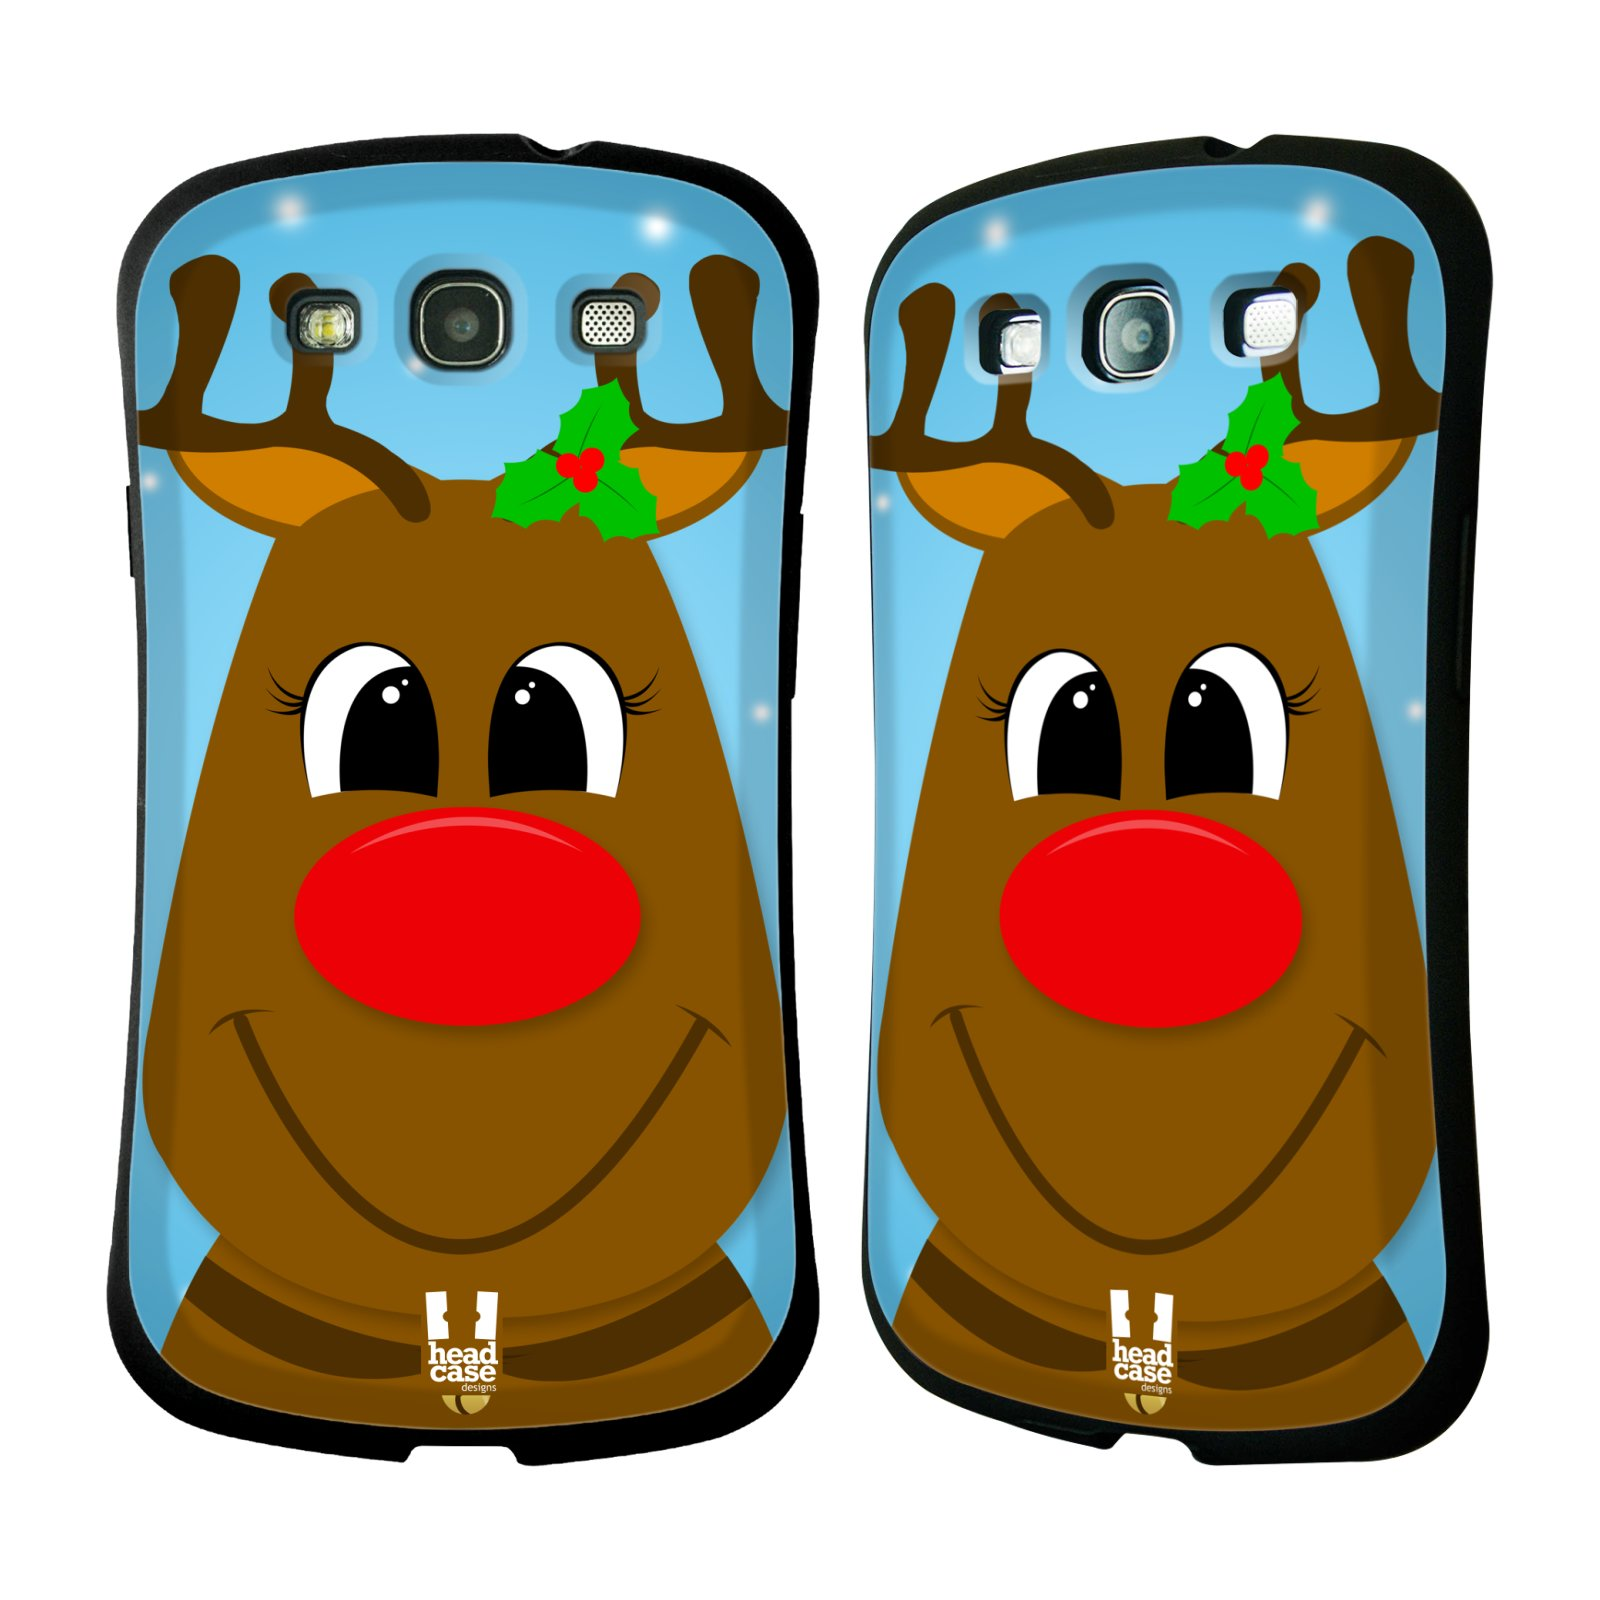 HEAD CASE silikon/plast odolný obal na mobil Samsung Galaxy S3 vzor Vánoční tváře kreslené SOB RUDOLF